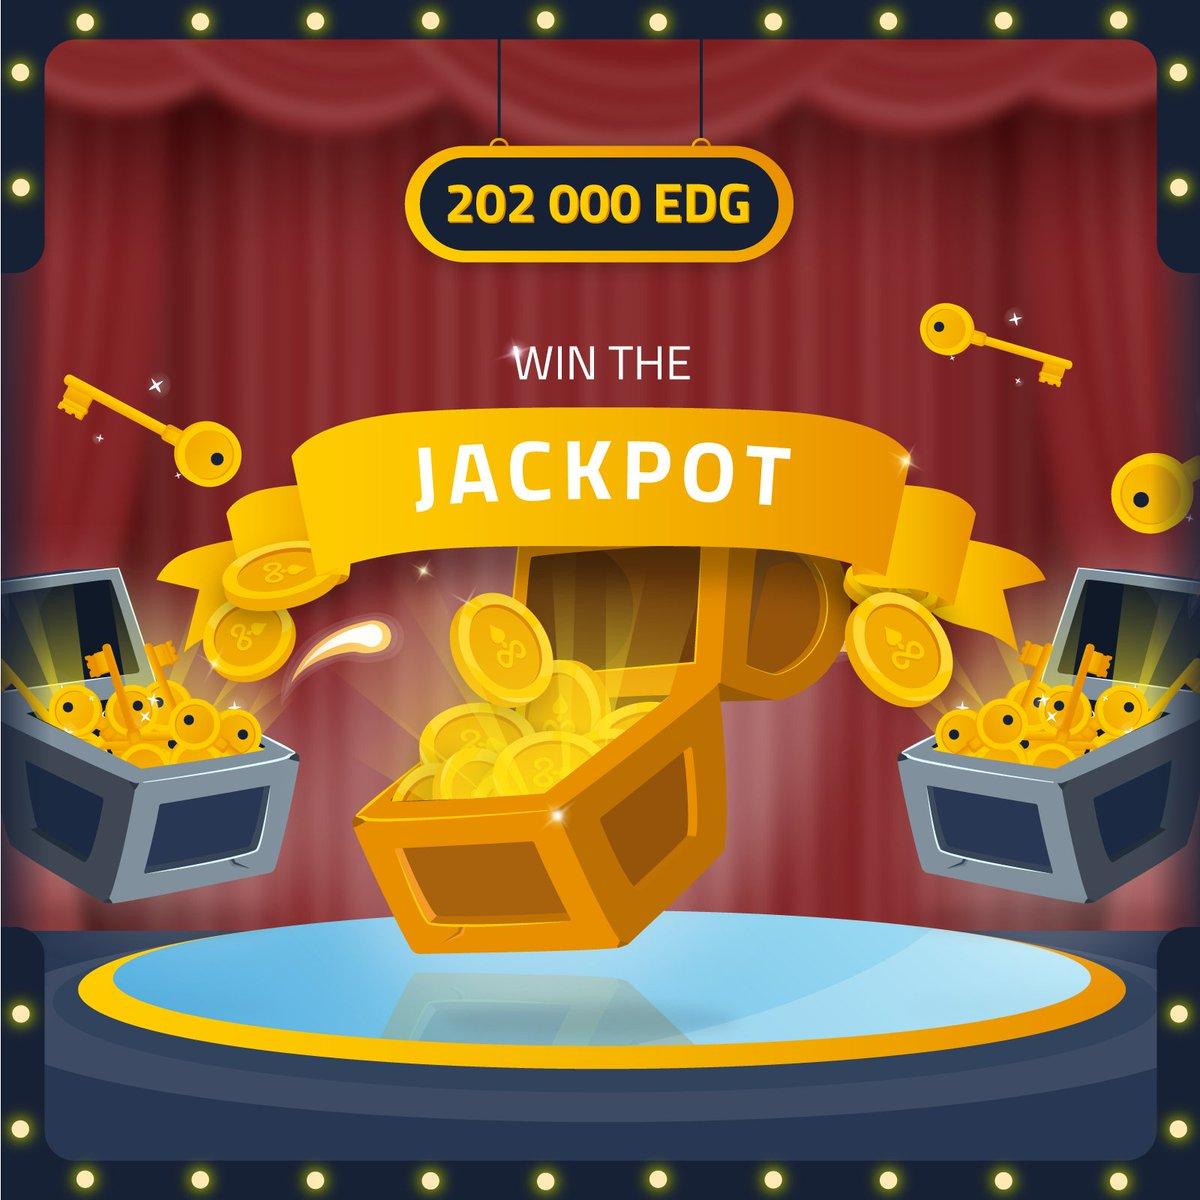 WIN 202 000 EDG. Enter now ➡️ https://t.co/n3MGWSoYZs #Edgeless #money #blockchain #win #crypto https://t.co/Kx3Ag57Sjx